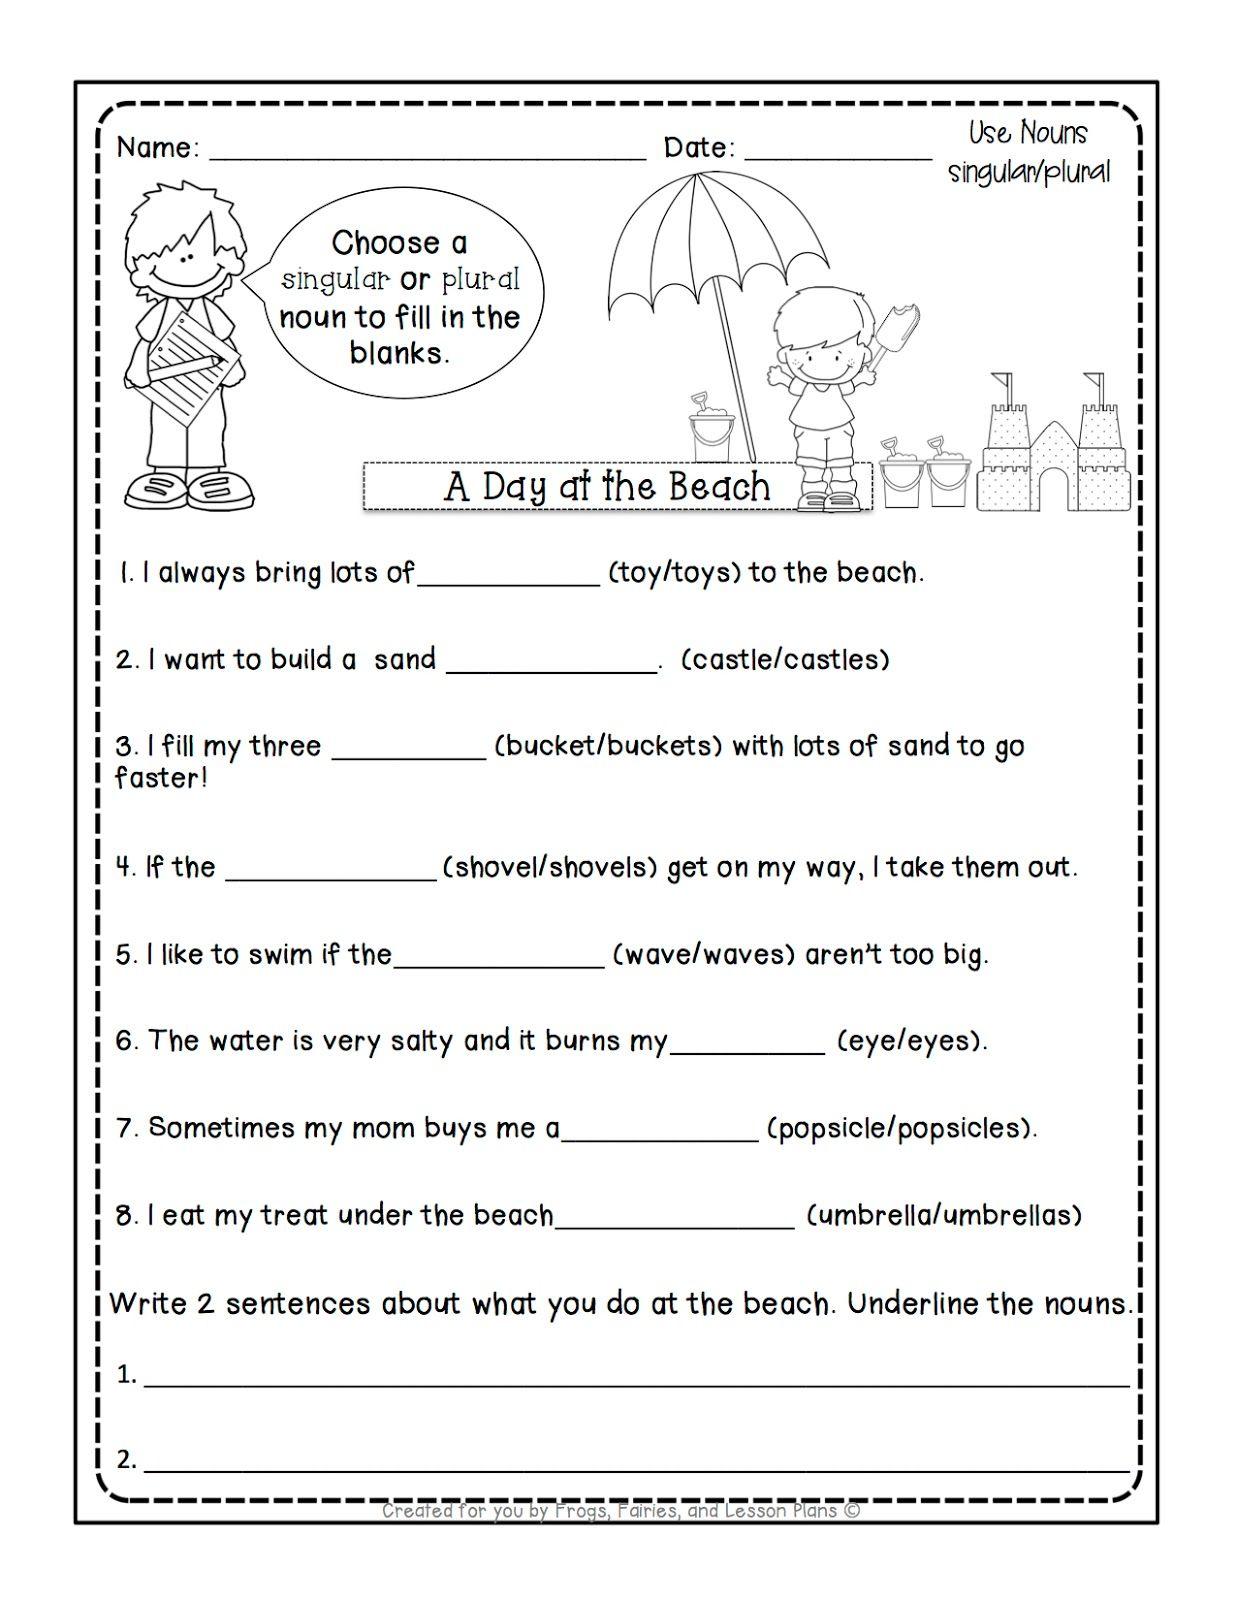 https://dubaikhalifas.com/grade-2-grammar-lesson-6-nouns-singular-and-plural-2-teaching-english-grammar-worksheets/ [ 91 x 1600 Pixel ]